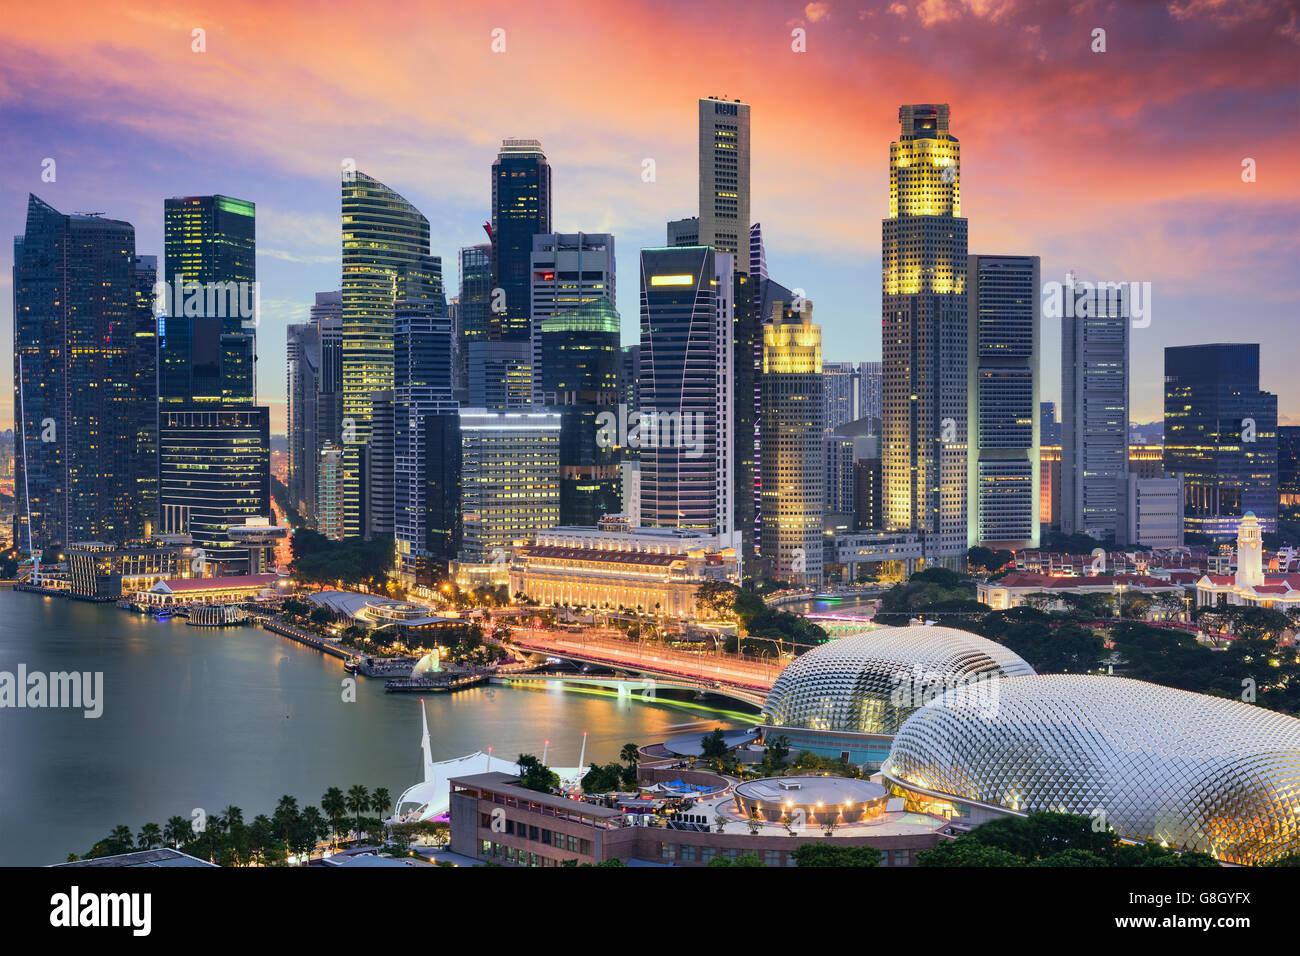 Singapore Financial District skyline al tramonto. Immagini Stock